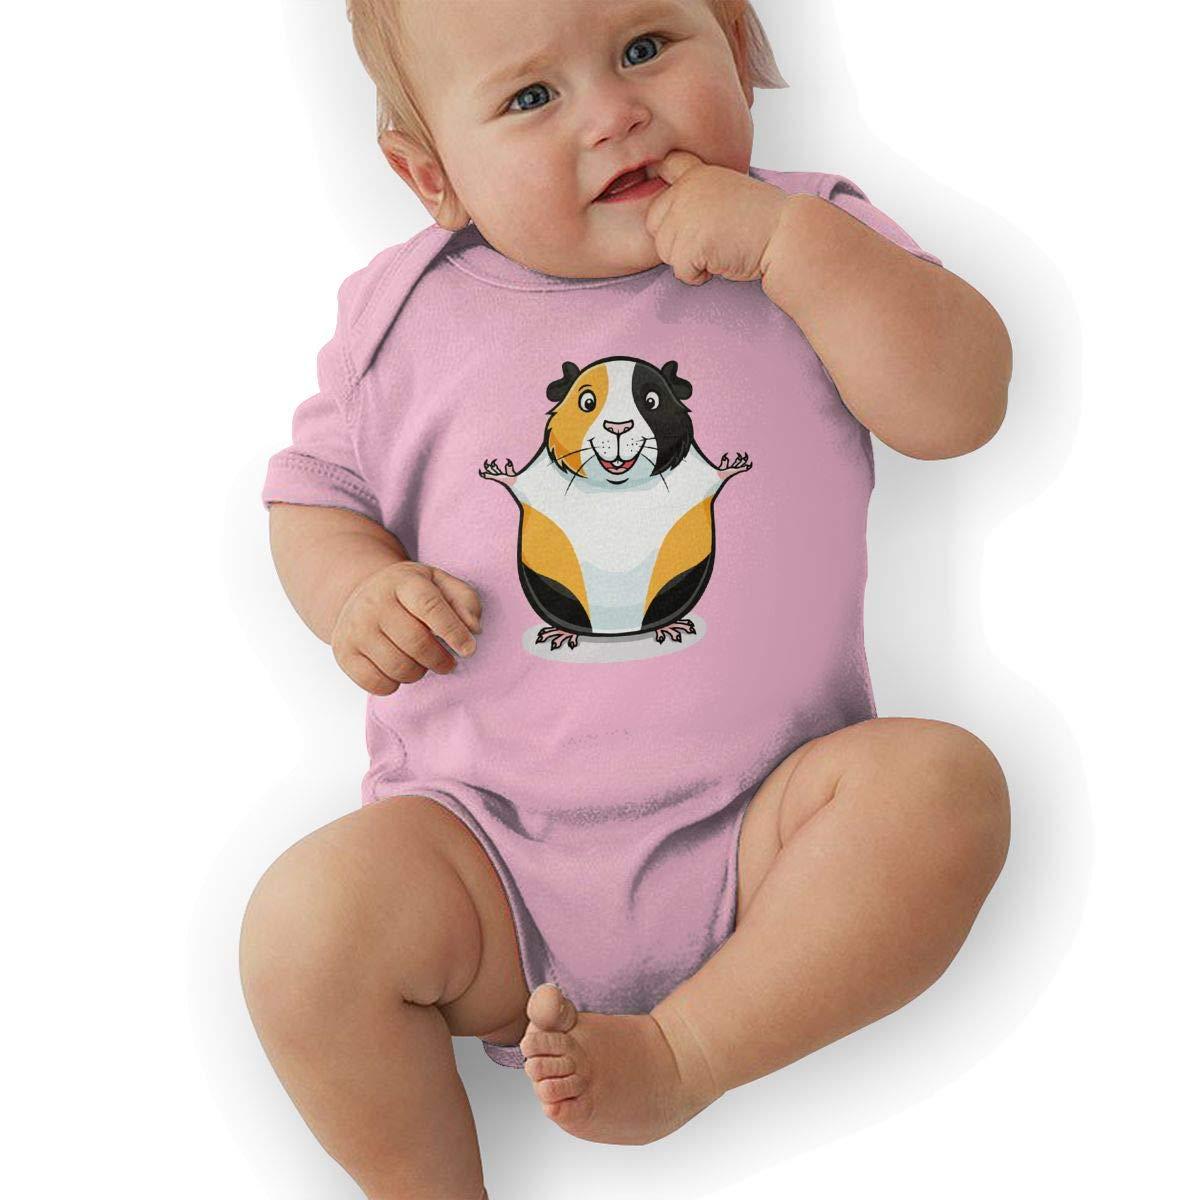 Guinea Pig Toddler Baby Girl Boy Romper Jumpsuit Short Sleeved Bodysuit Tops Clothes